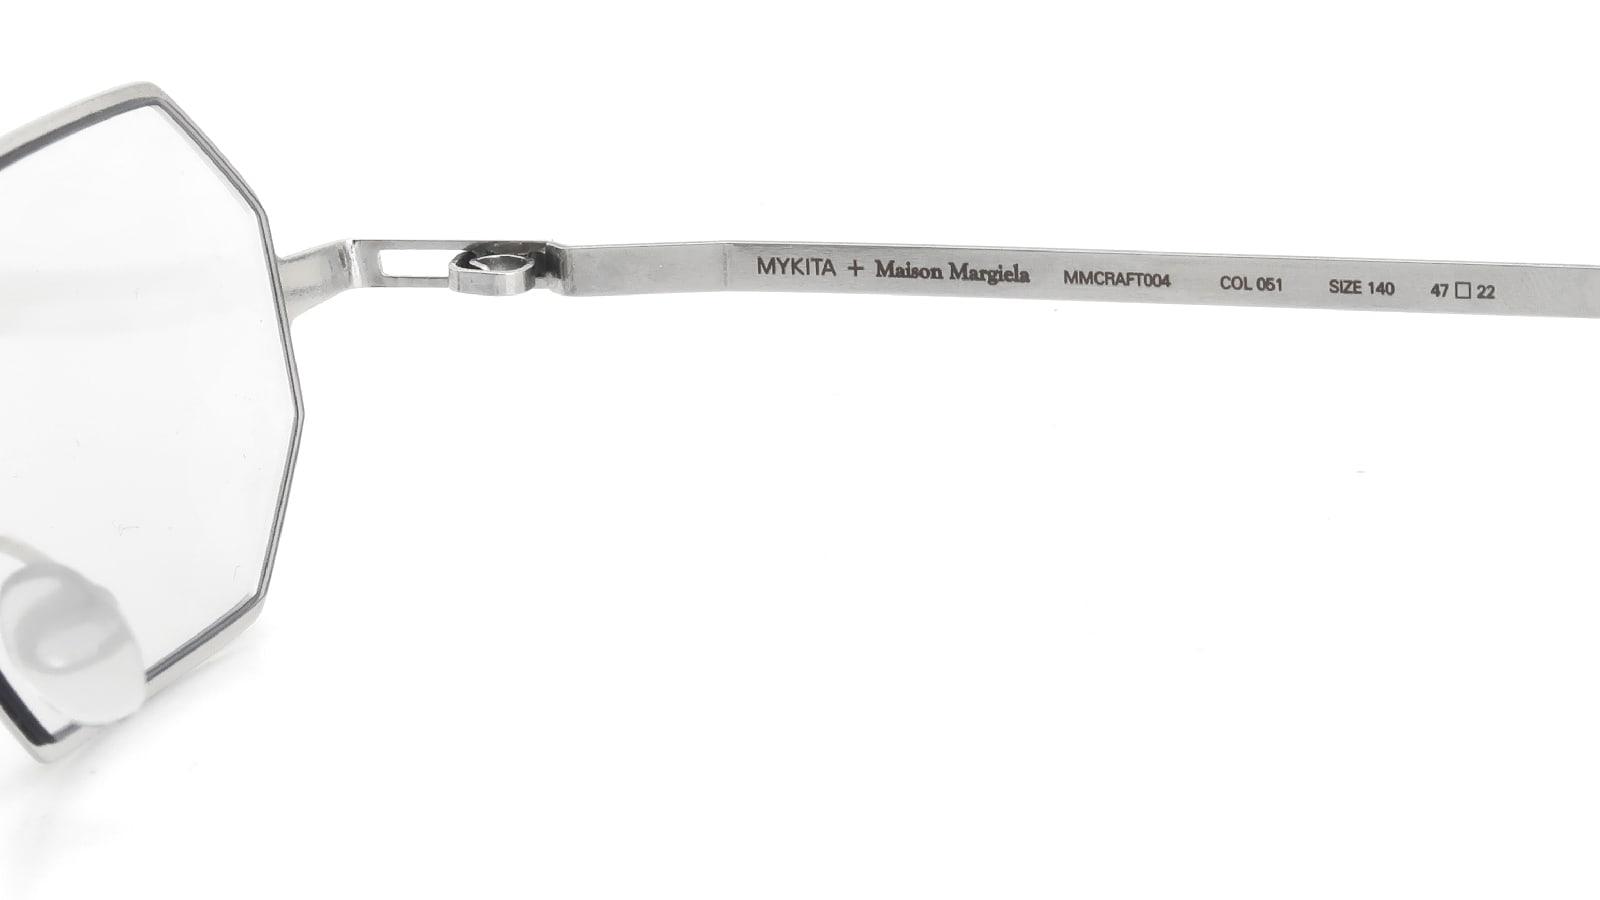 MYKITA + Maison Margiela MMCRAFT004 COL.051 Shiny Silver 10